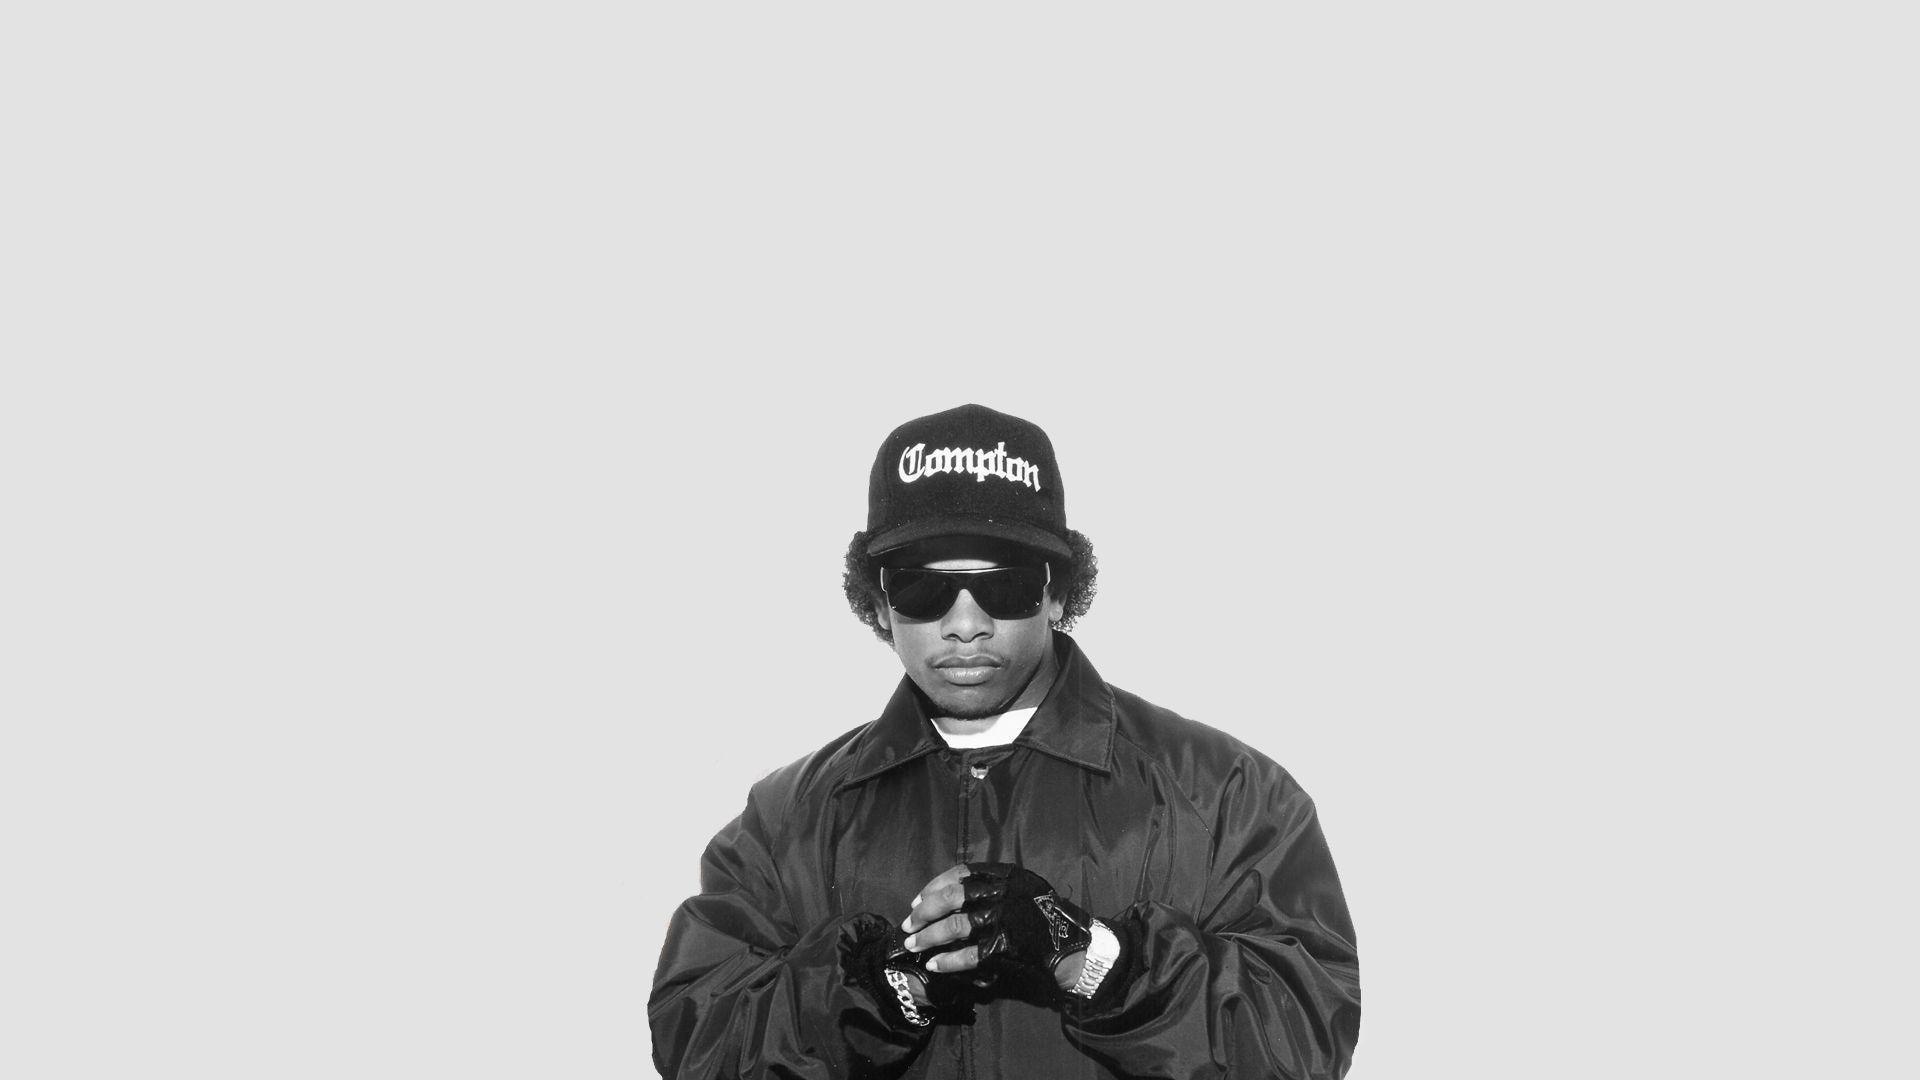 Eazy E 4k Wallpapers Top Free Eazy E 4k Backgrounds